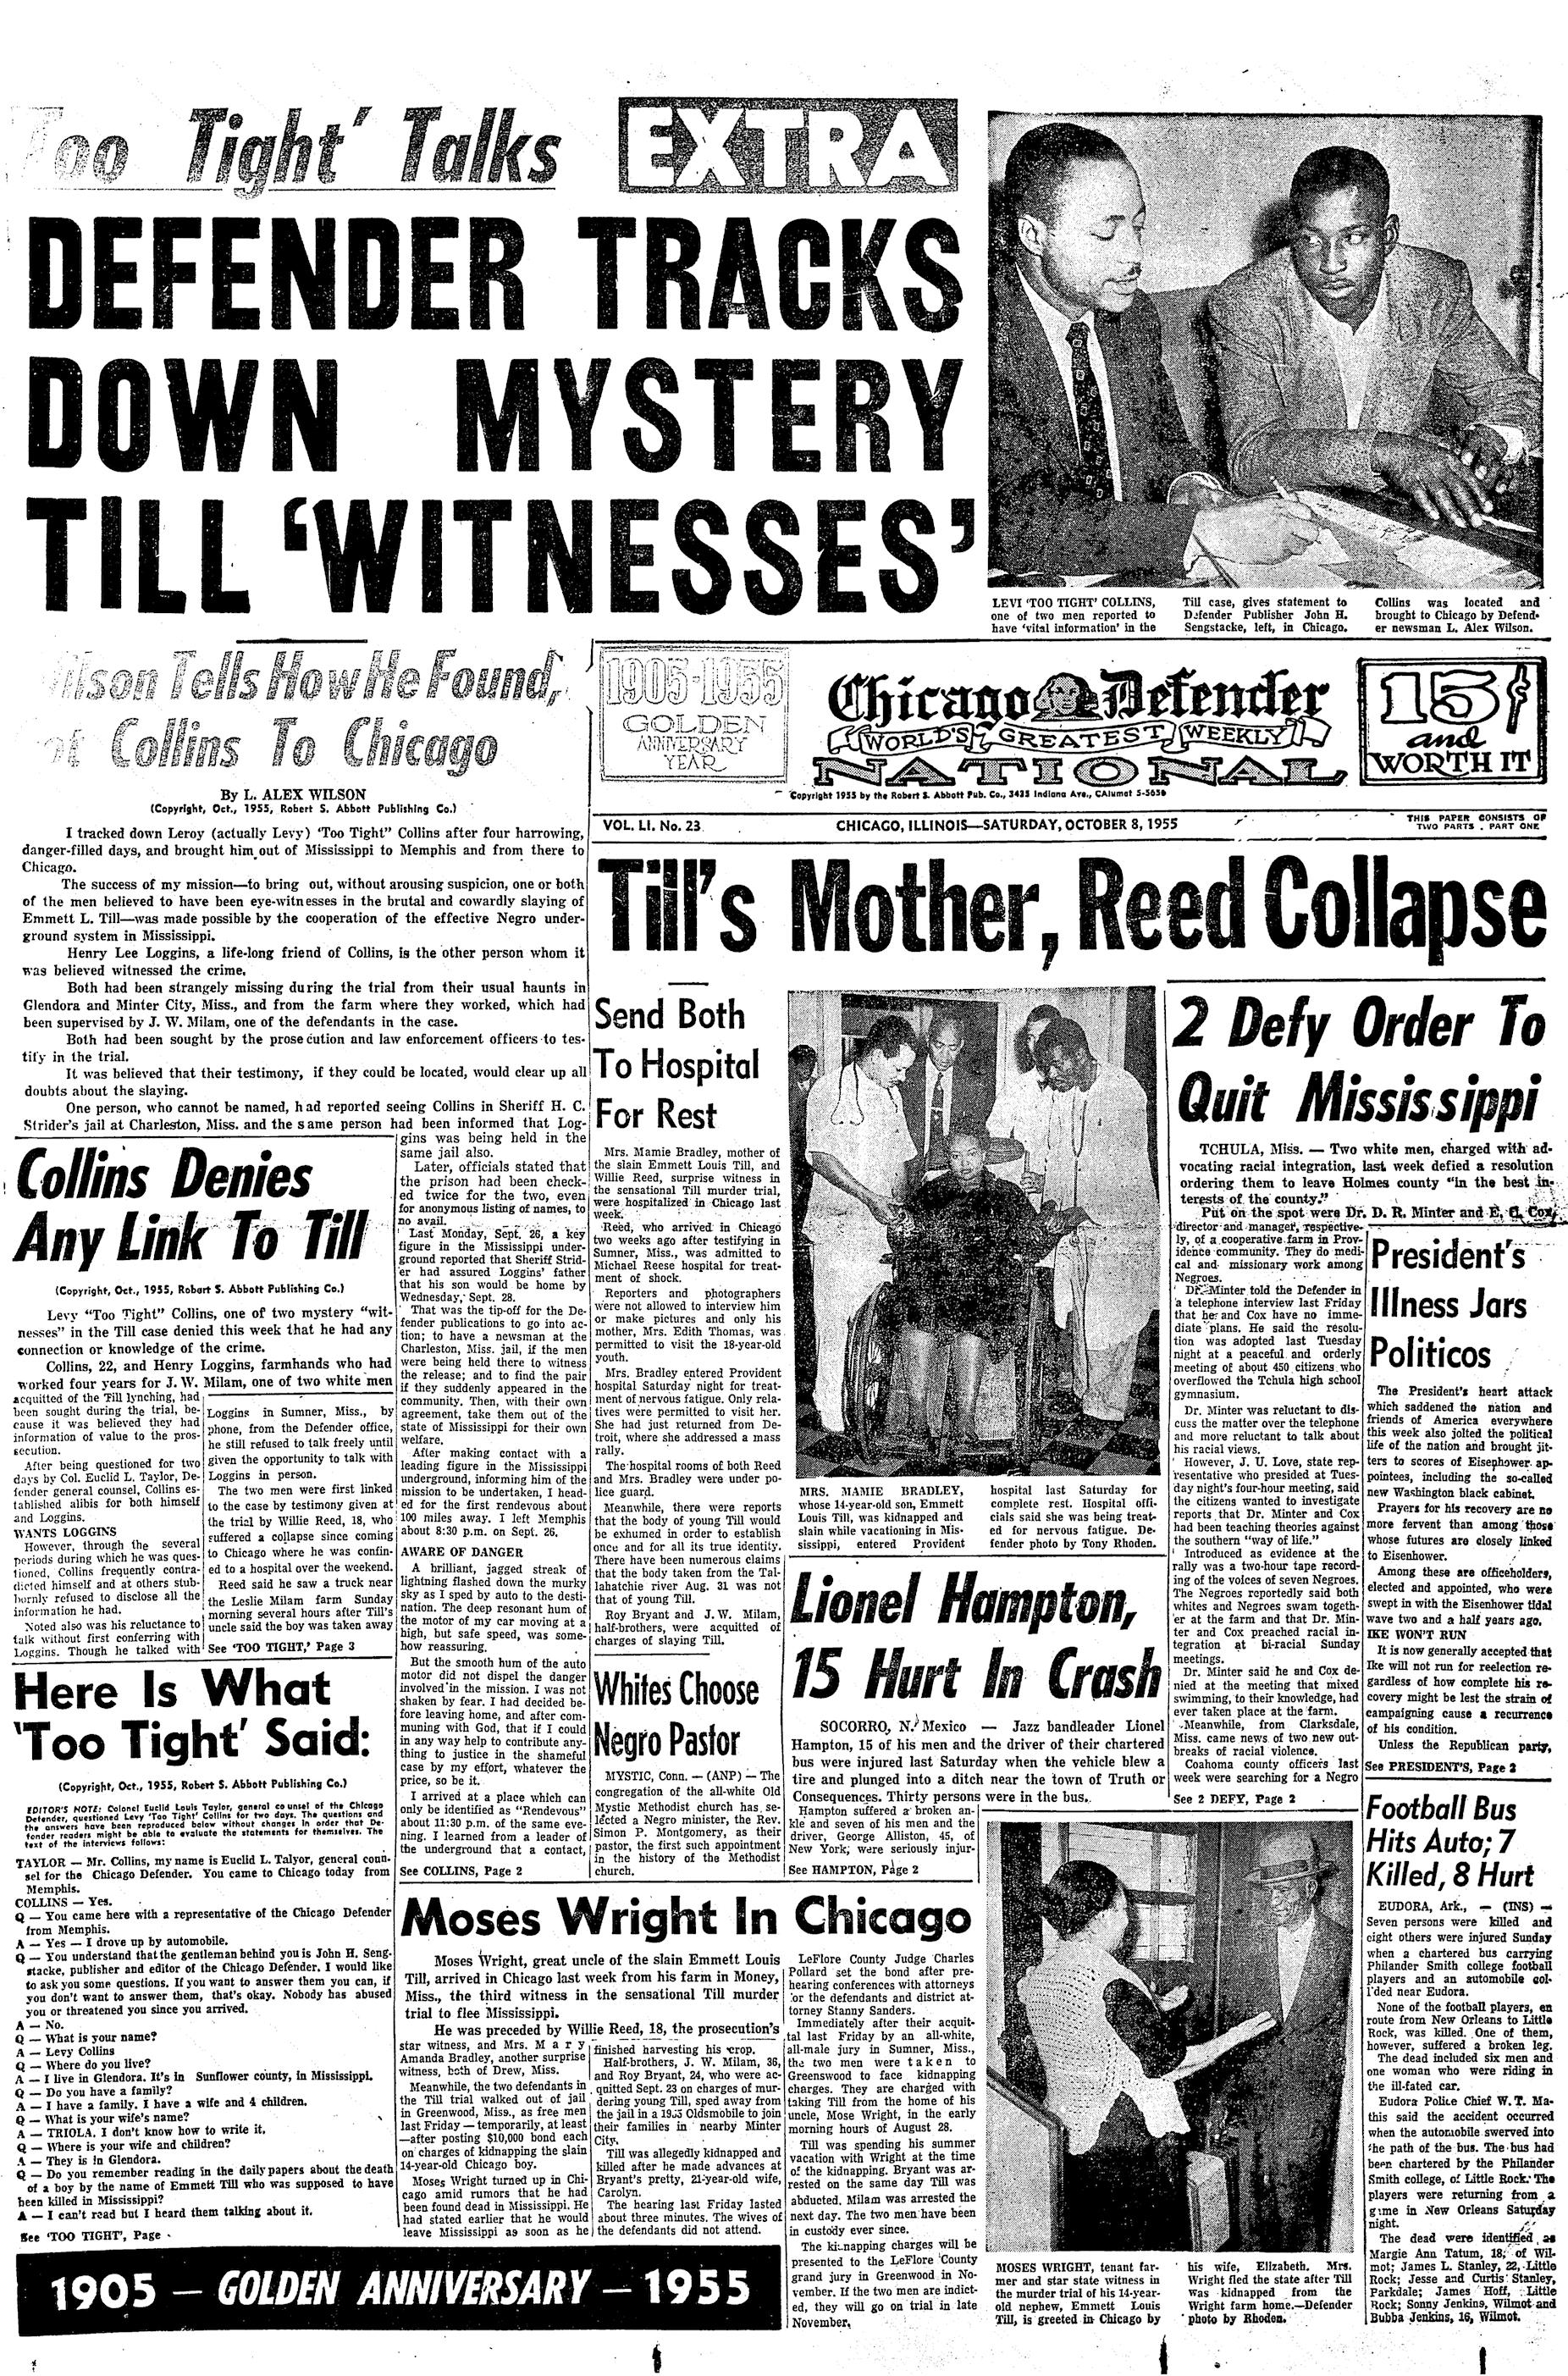 10.8.1955